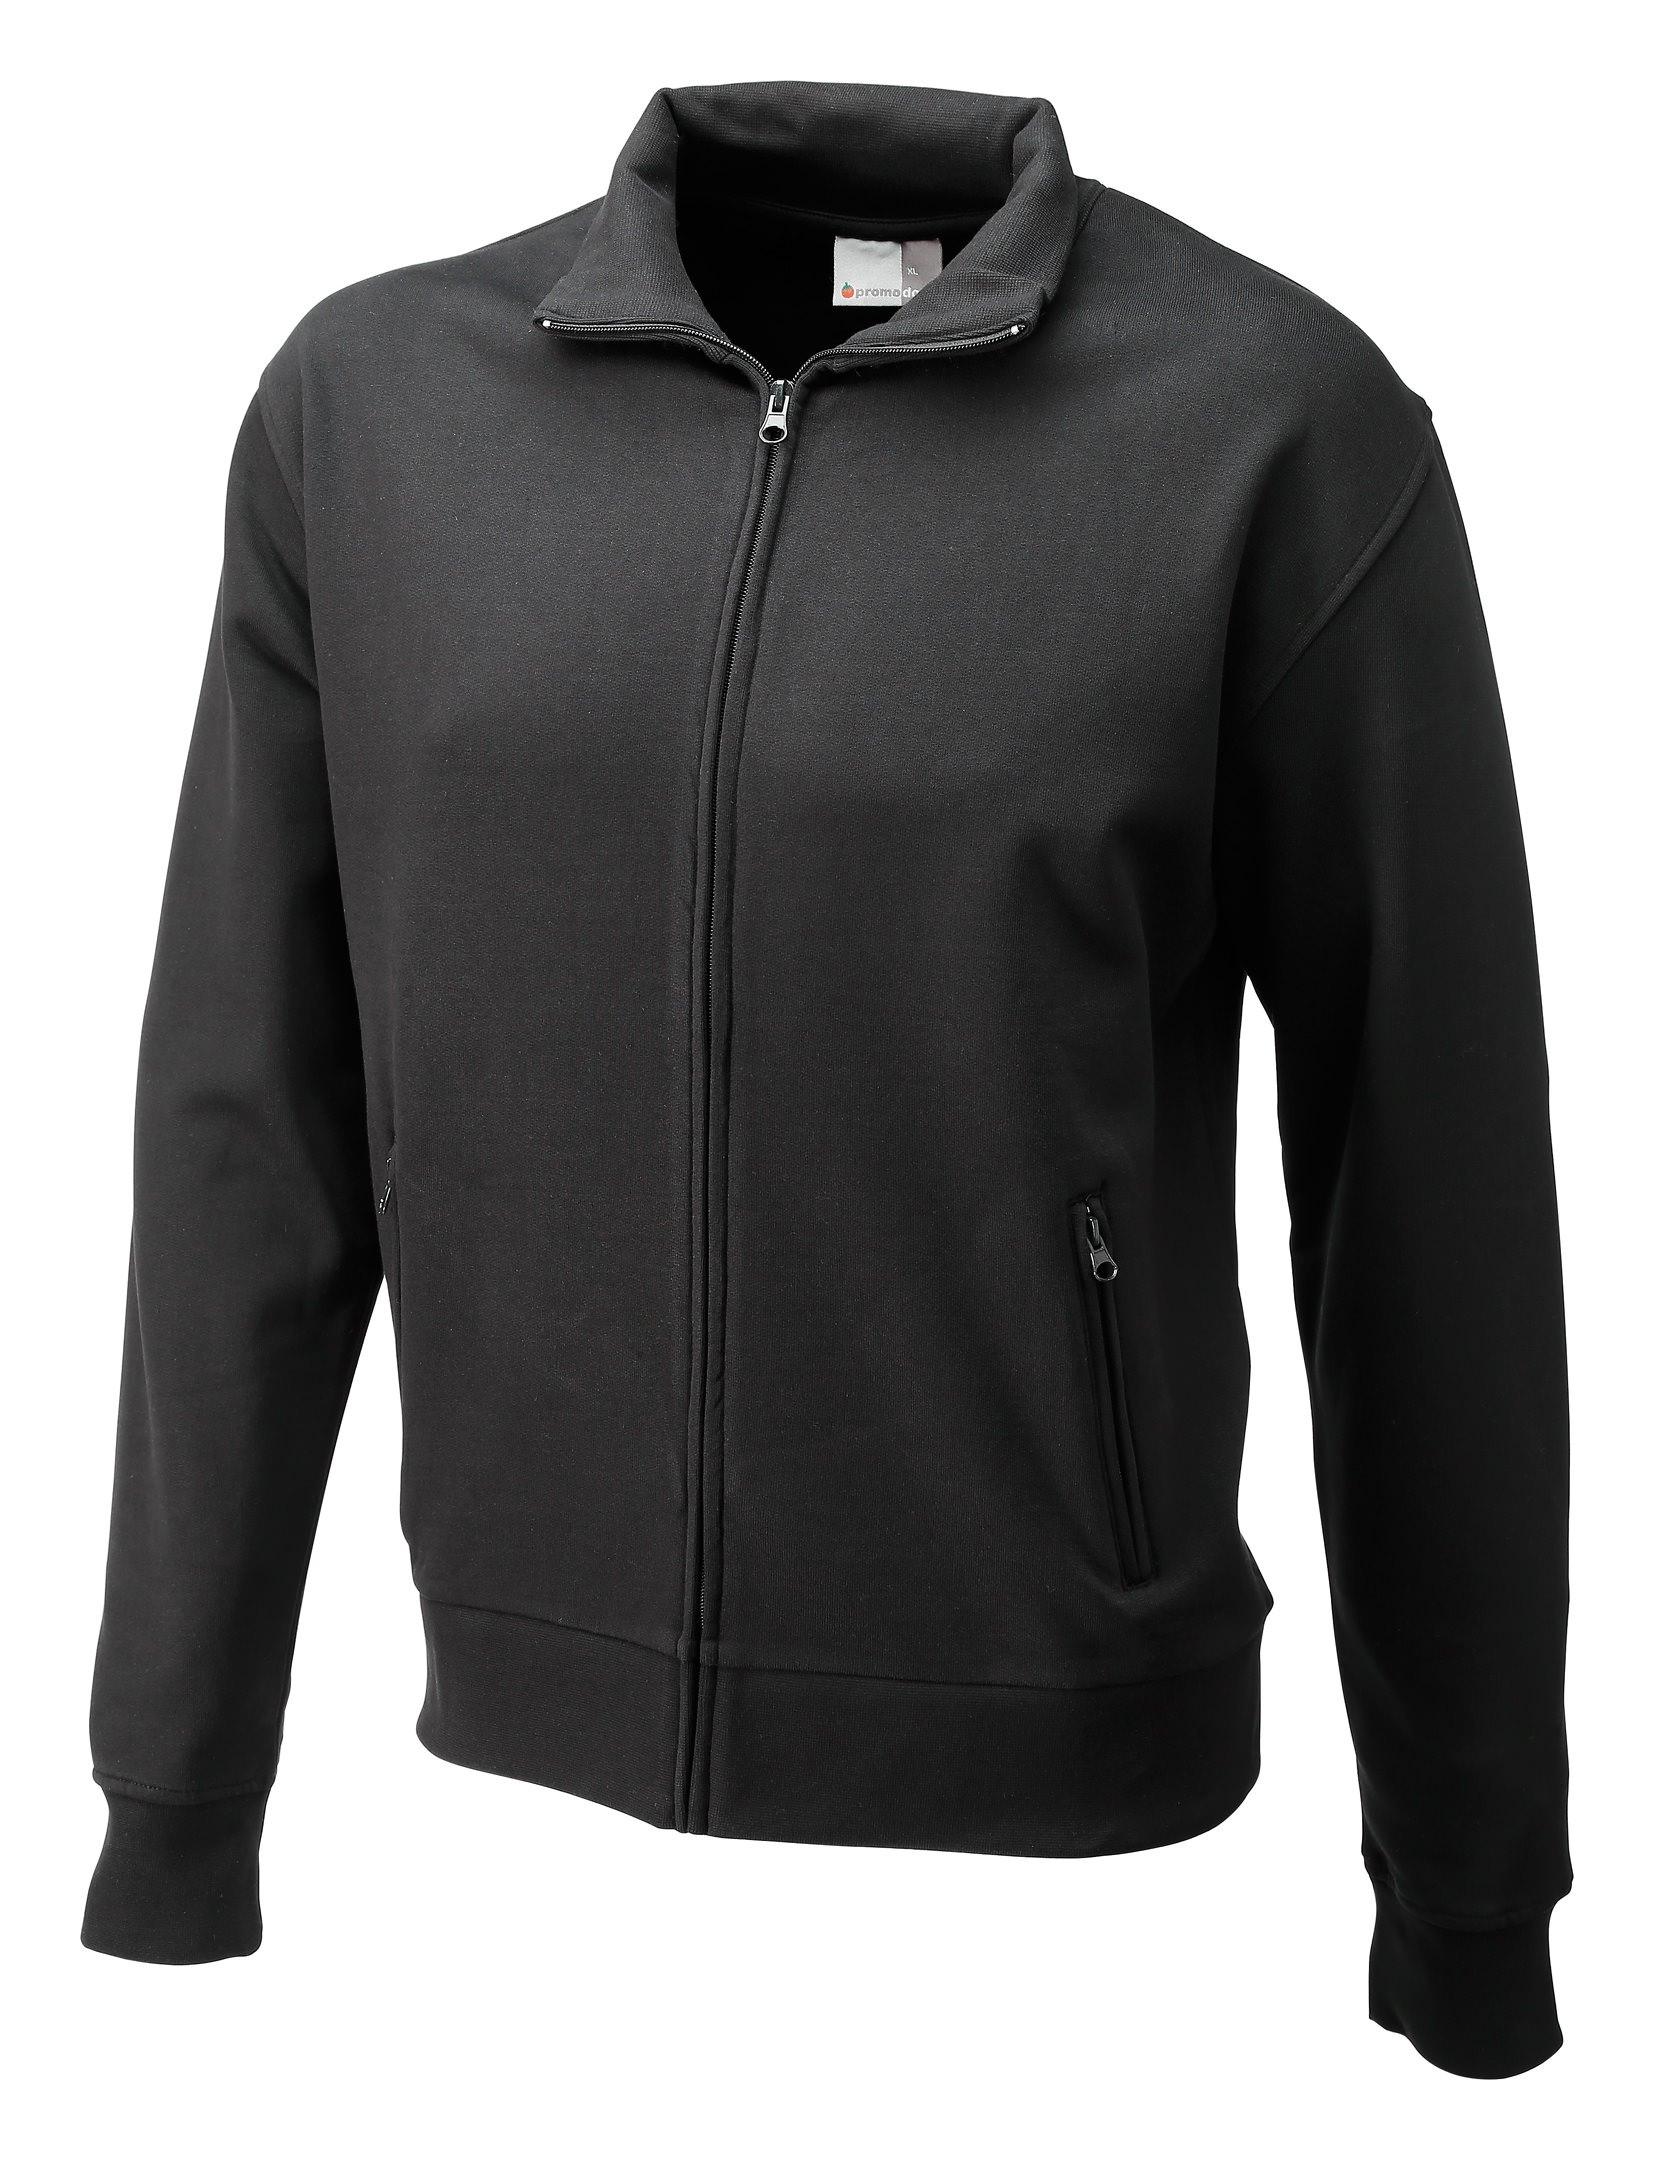 Sweatshirtjacke Größe XXL schwarz - 5290F-9D-2XL